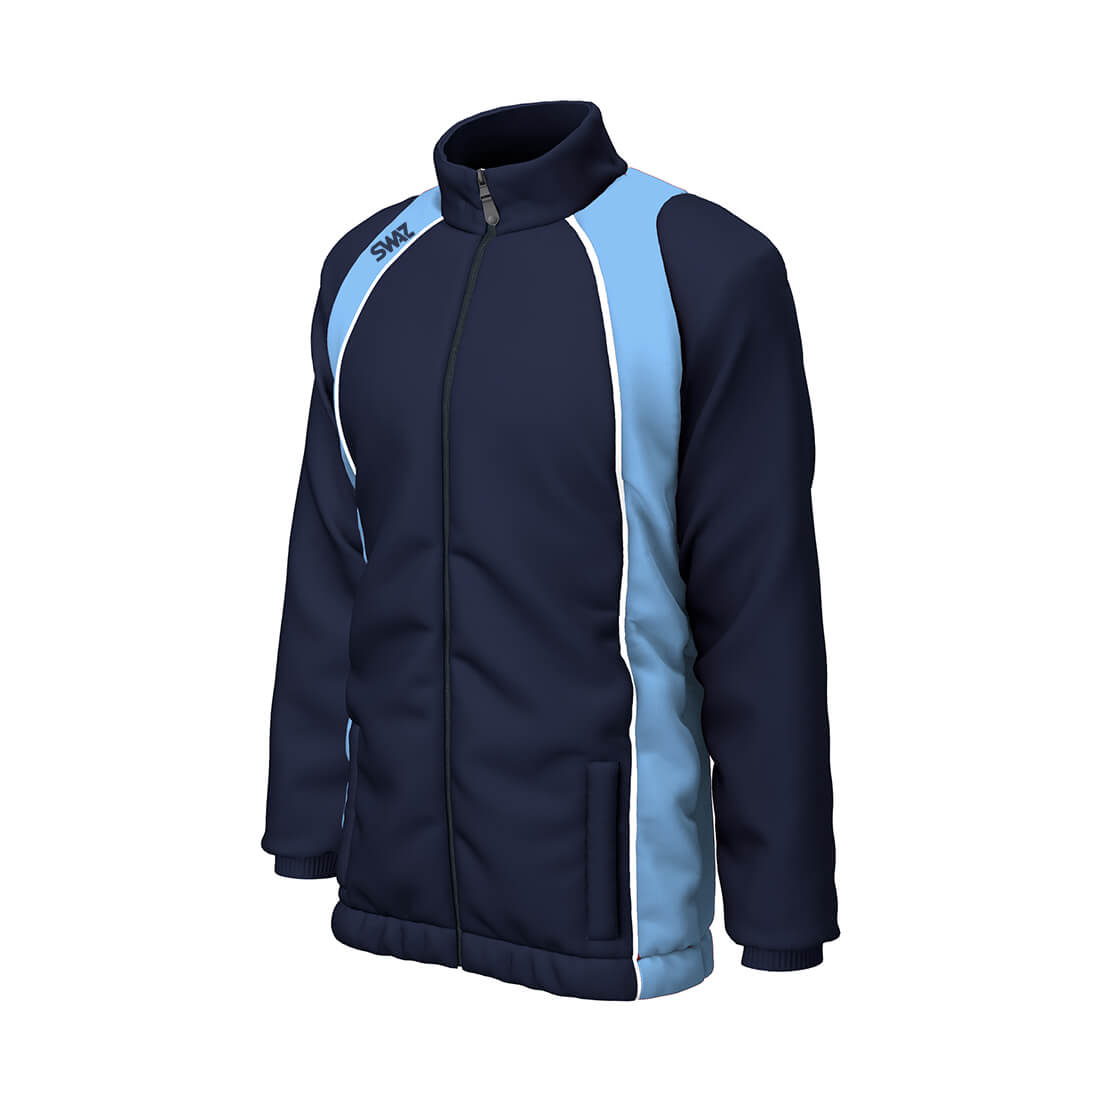 Football Showerproof Jacket | Football Training Kit and Teamwear – SWAZ